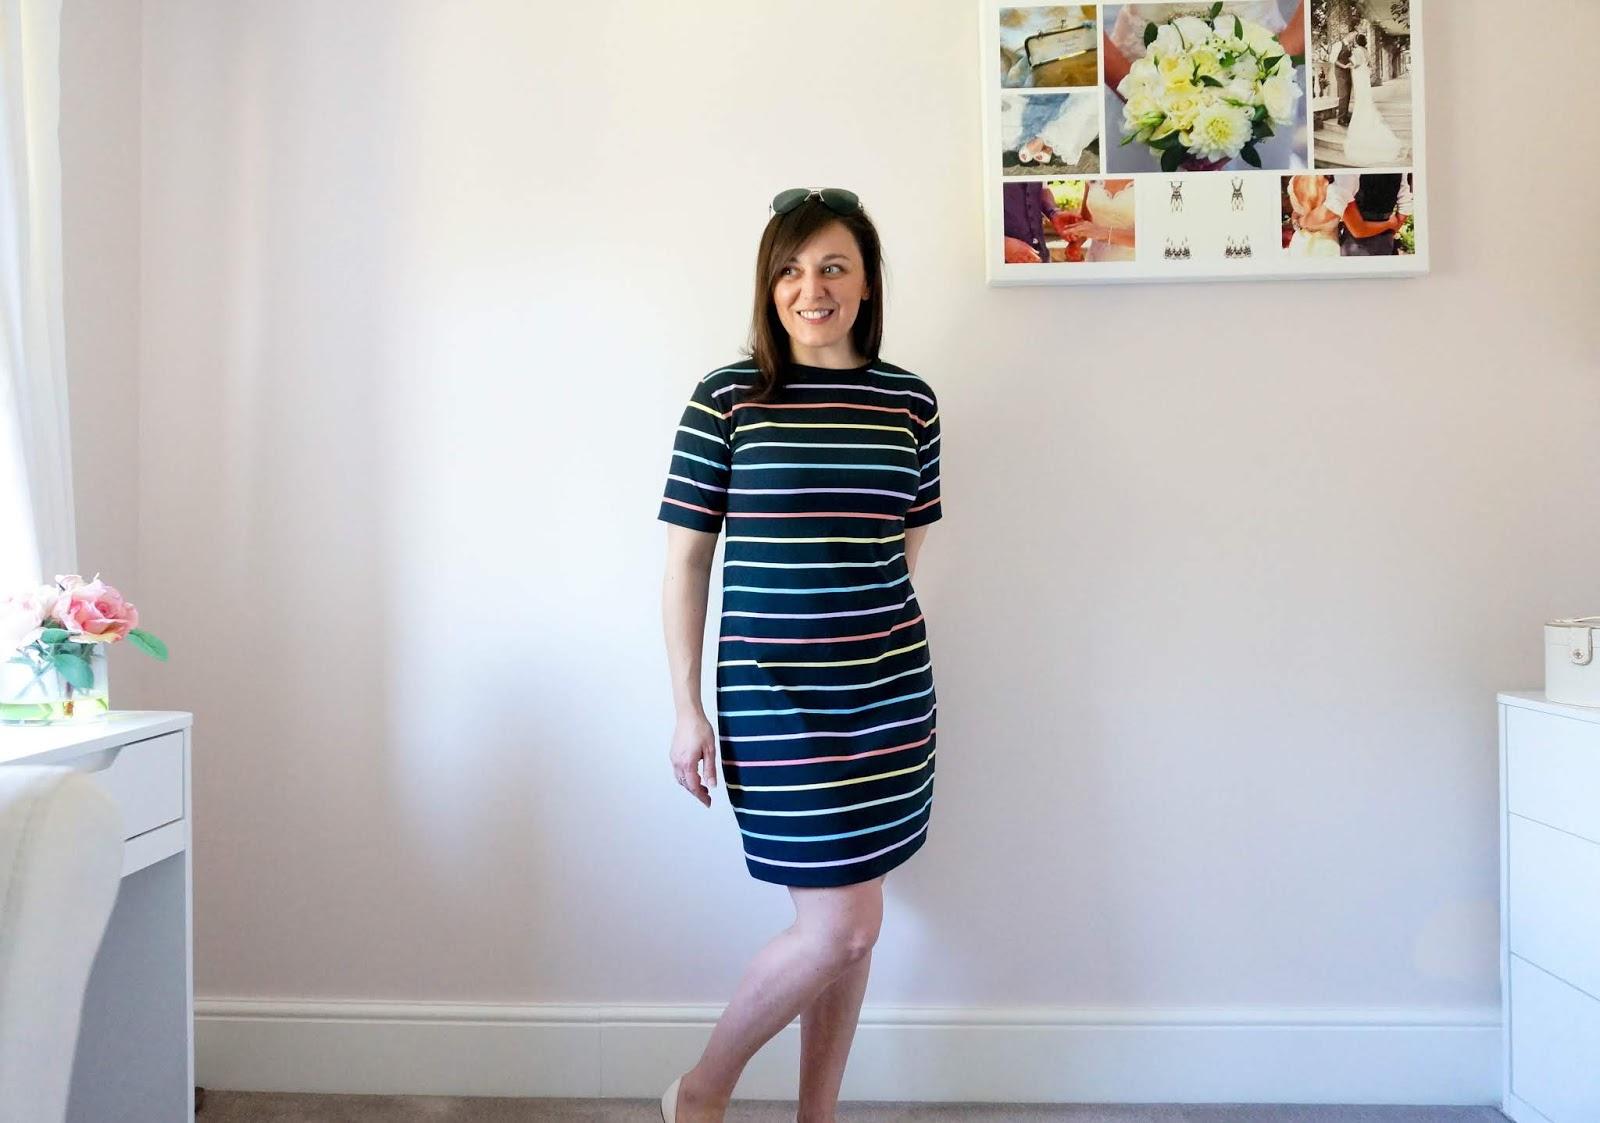 http://www.thepetitepassions.com/2020/04/rainbow-t-shirt-dress.html